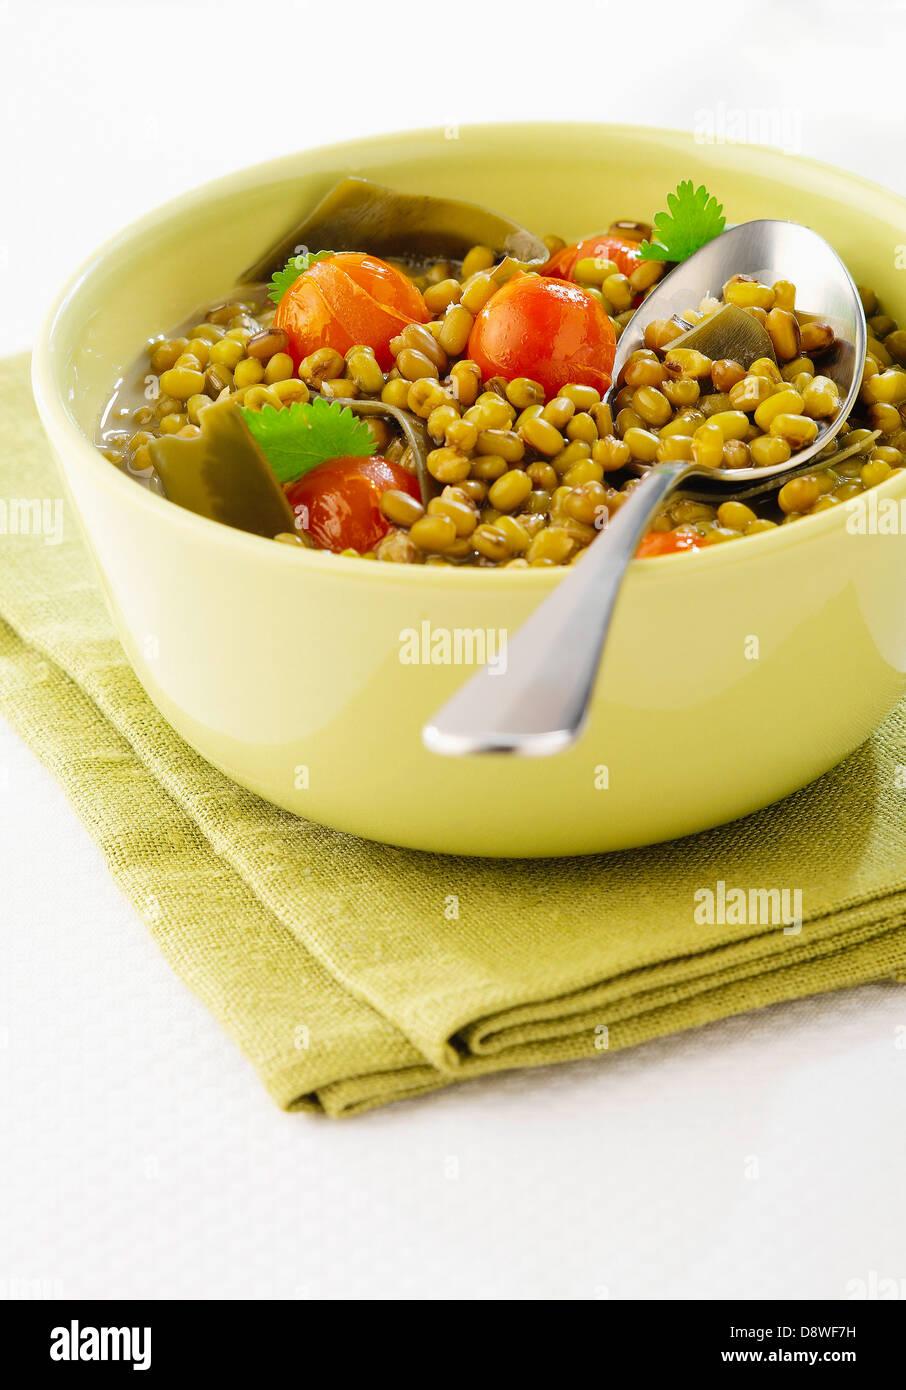 Soya bean and tomato salad - Stock Image